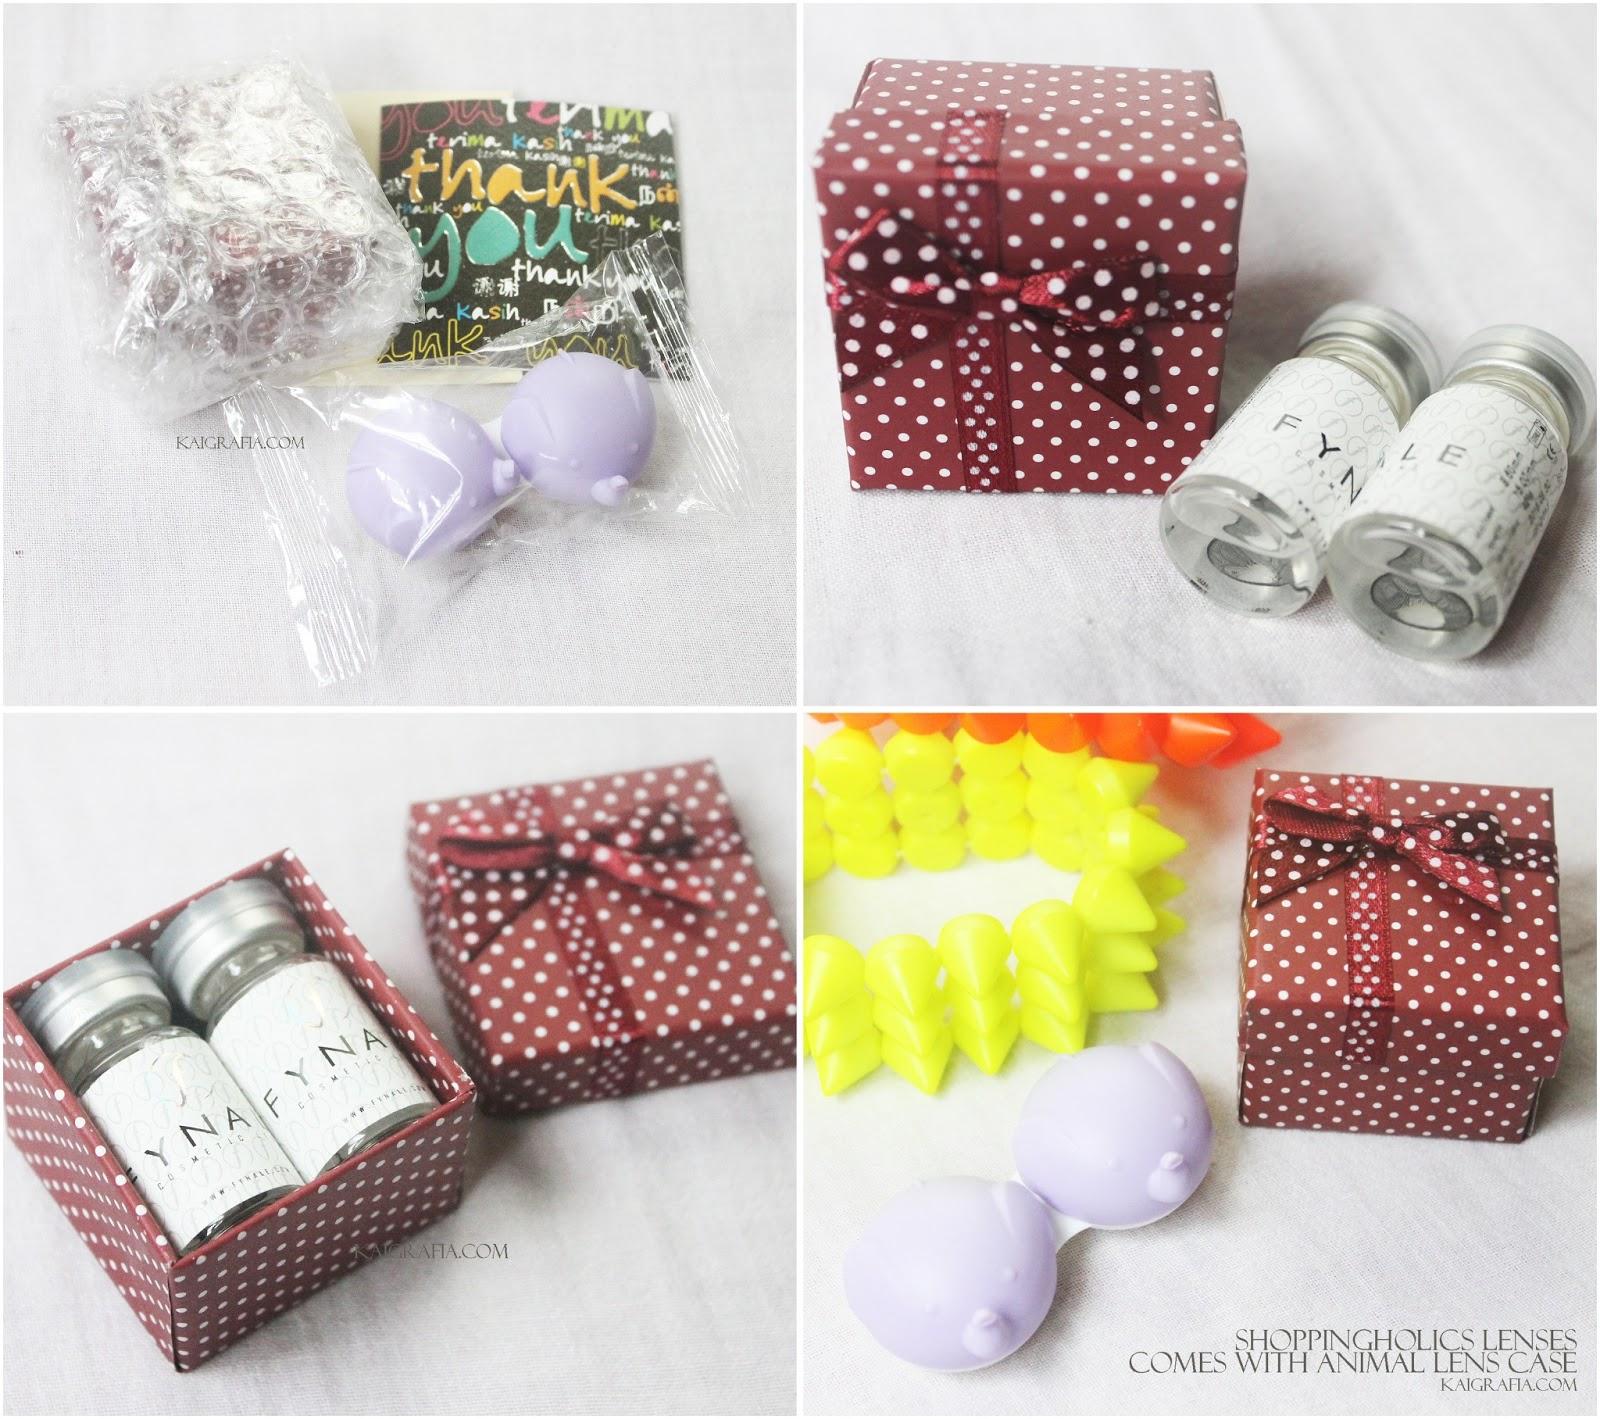 Cute Packaging materials